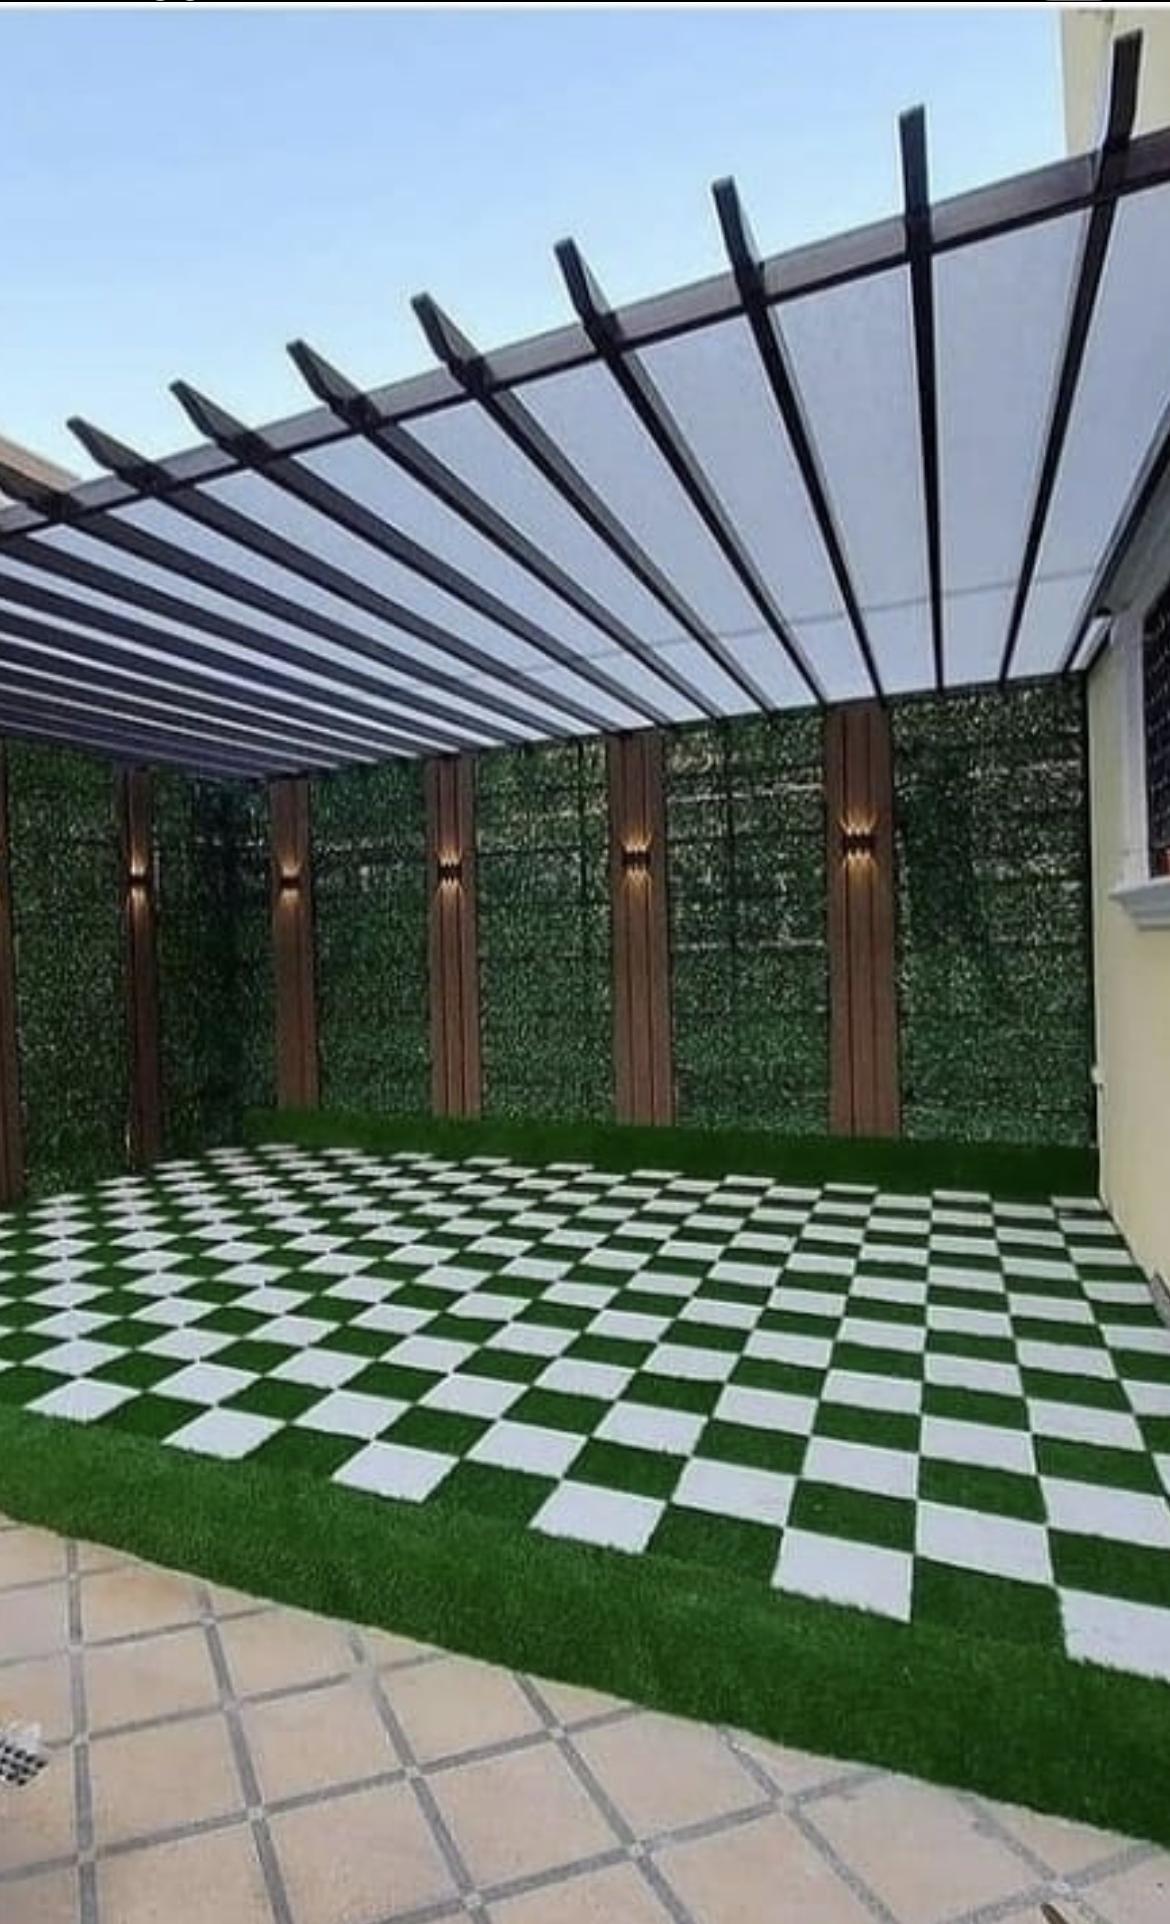 Interior design, Gypsum, Paint, tiles, plumbing. P